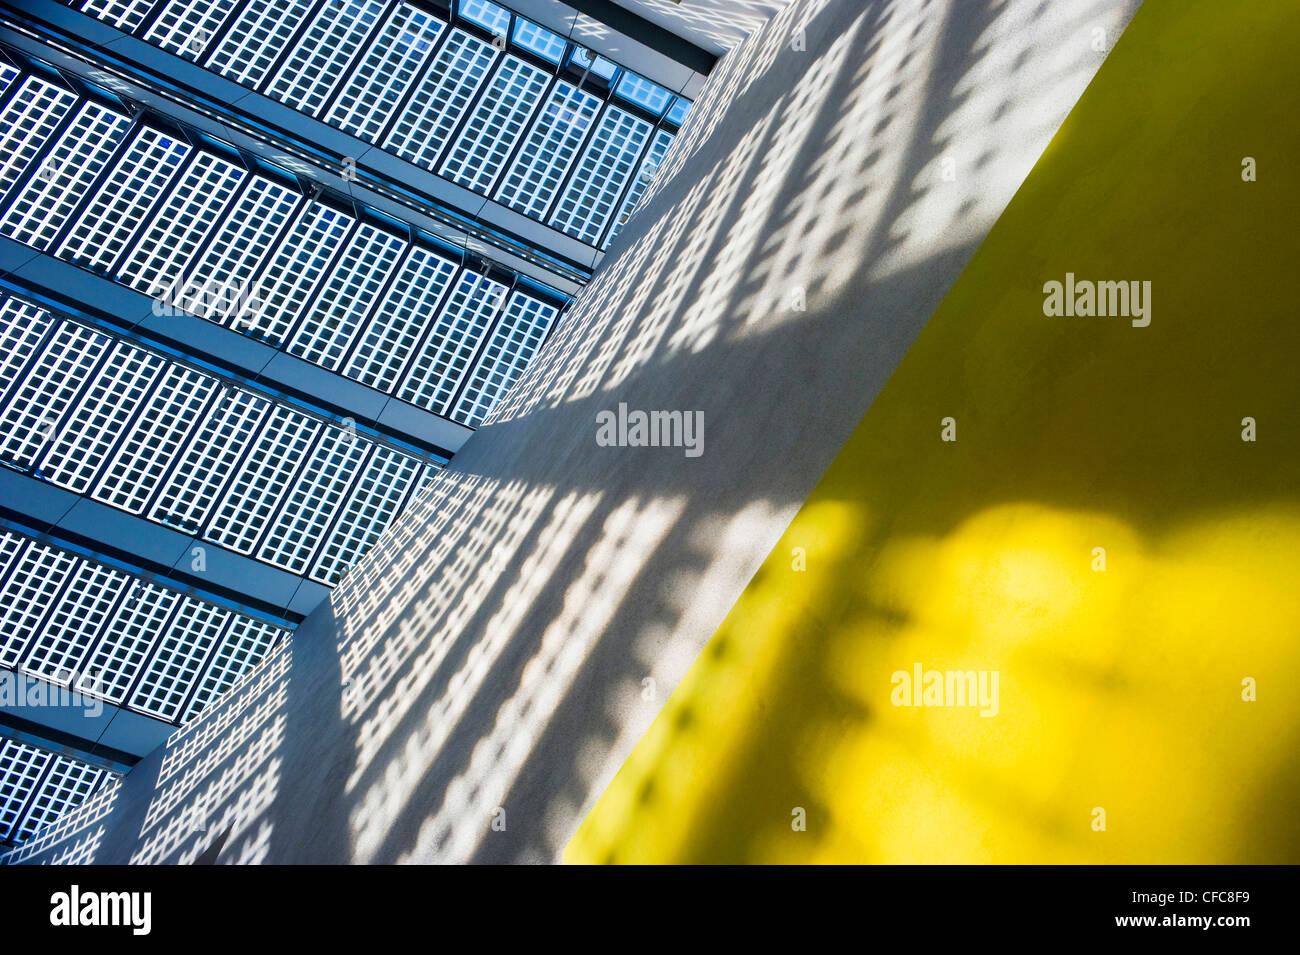 Solar installation on glass roof, Fraunhofer institute, Freiburg im Breisgau, Baden-Wurttemberg, Germany - Stock Image